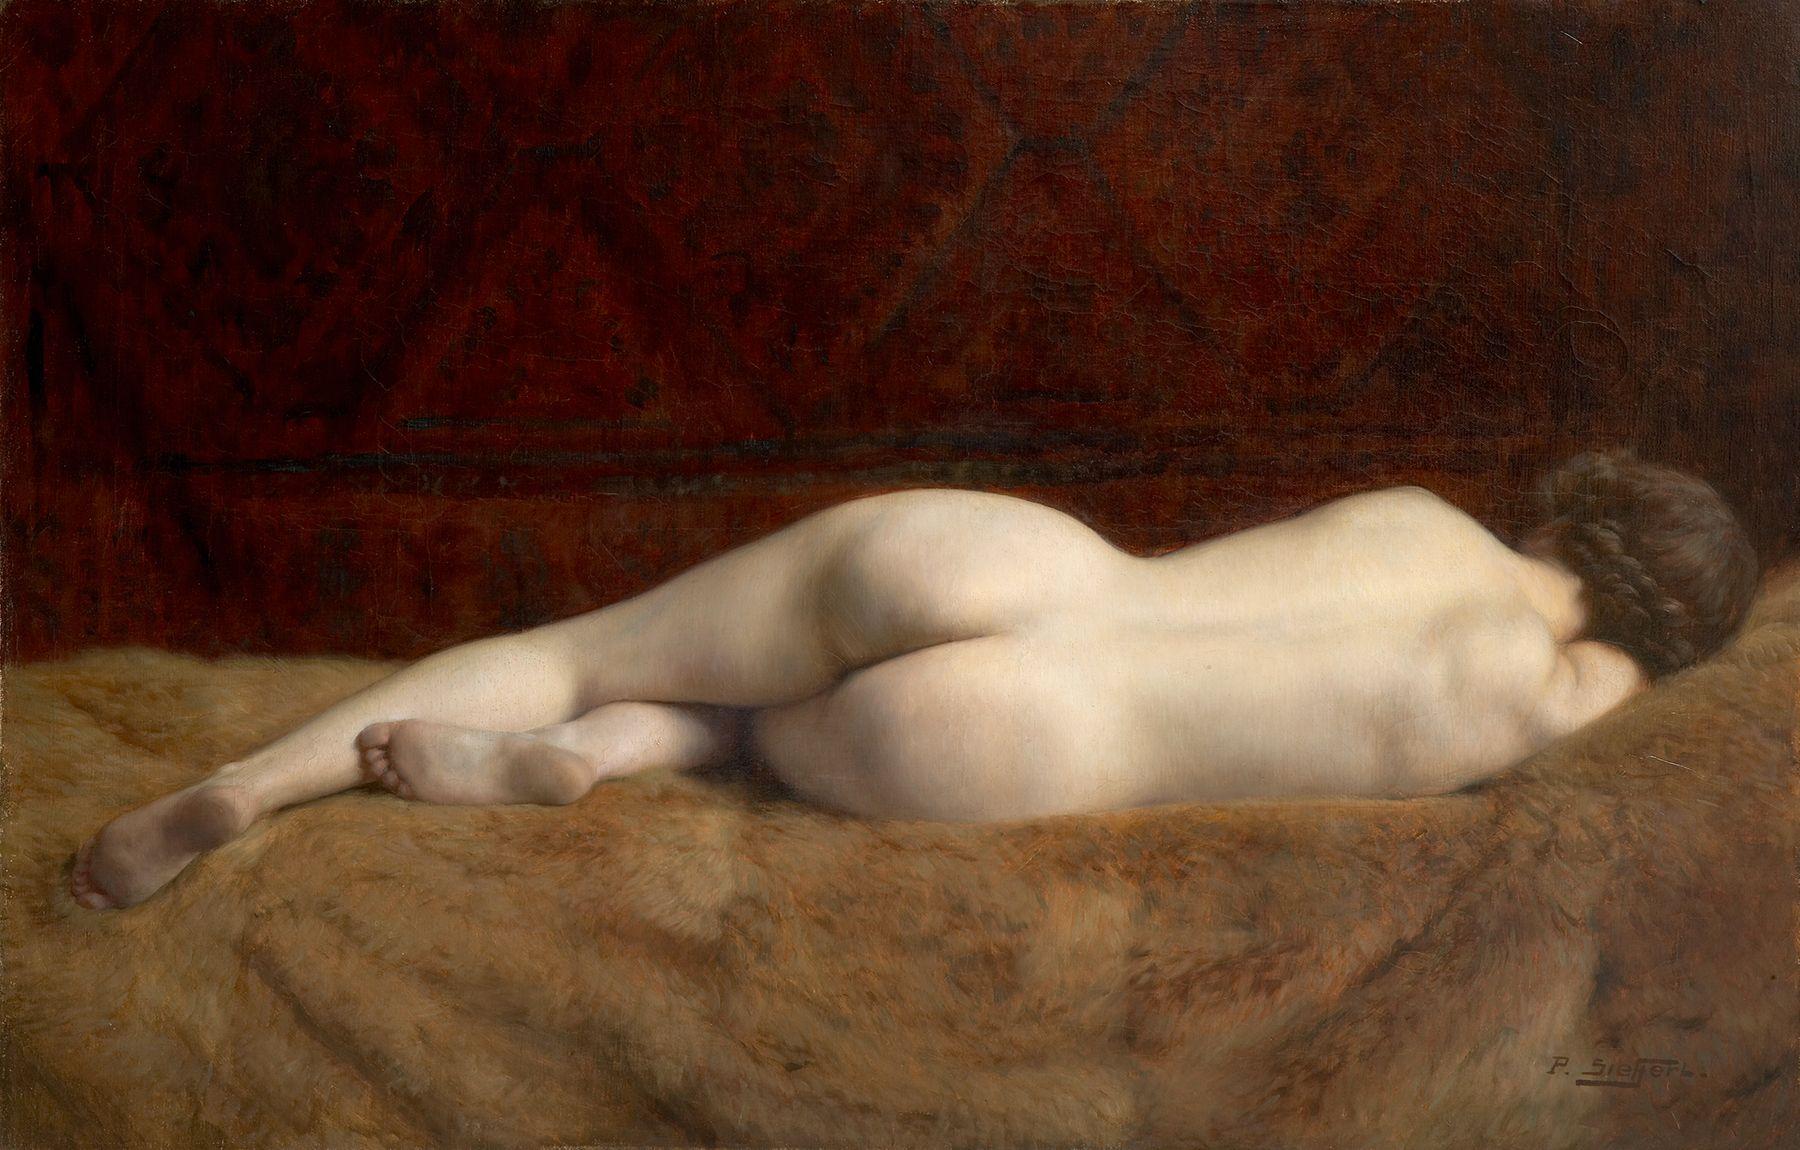 Erotic paintings of serge marshennikov 2 - 3 9